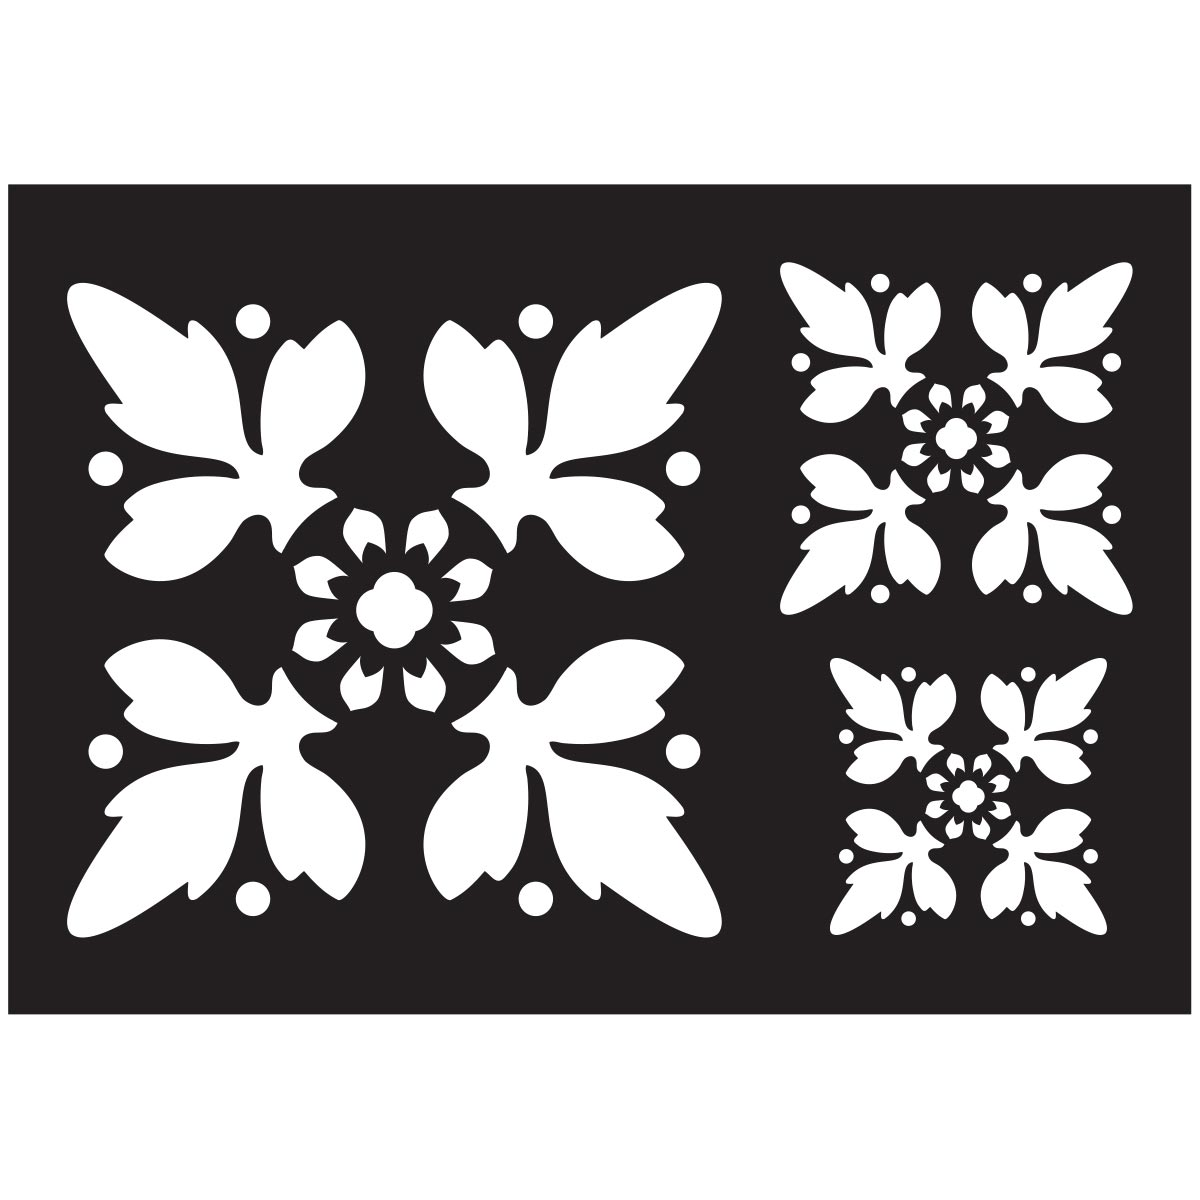 FolkArt ® Painting Stencils - Tile Motif - 59783